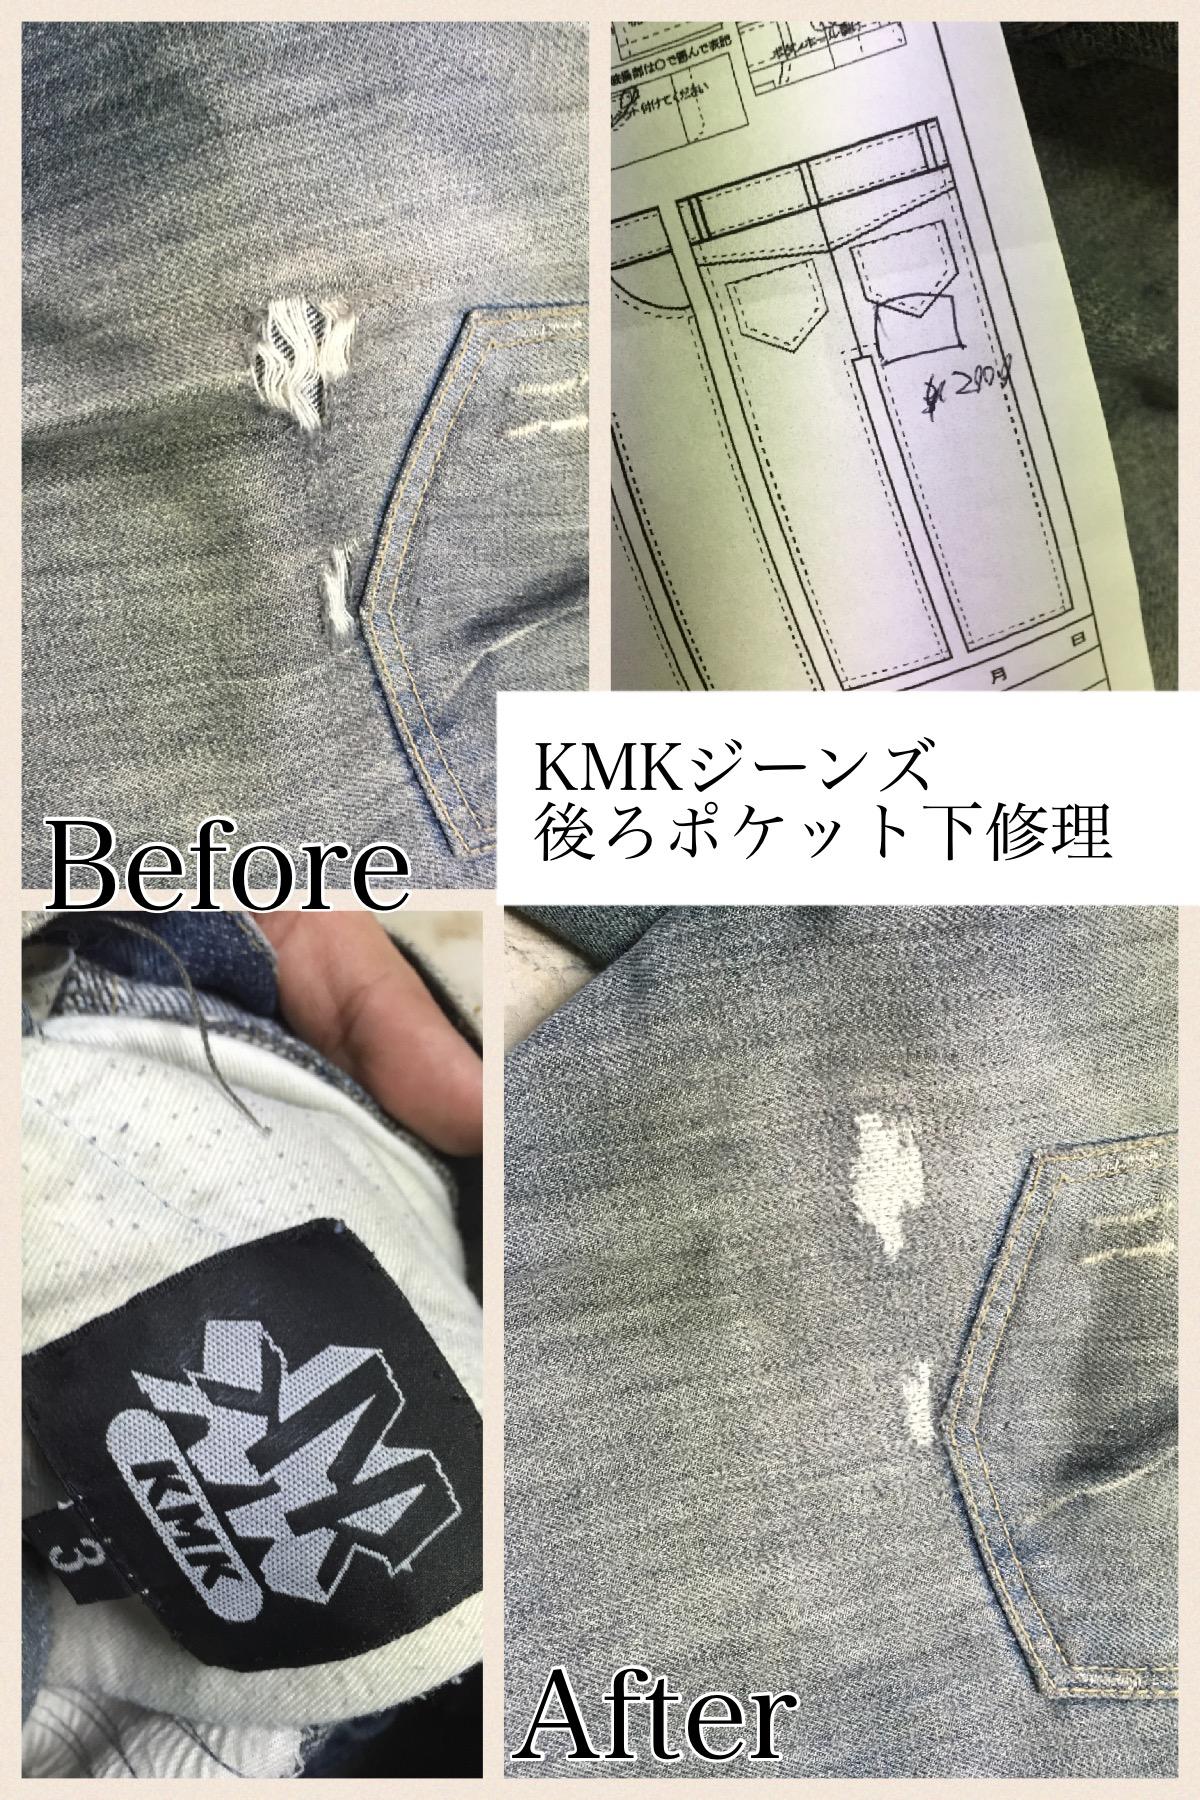 KMKジーンズ穴修理